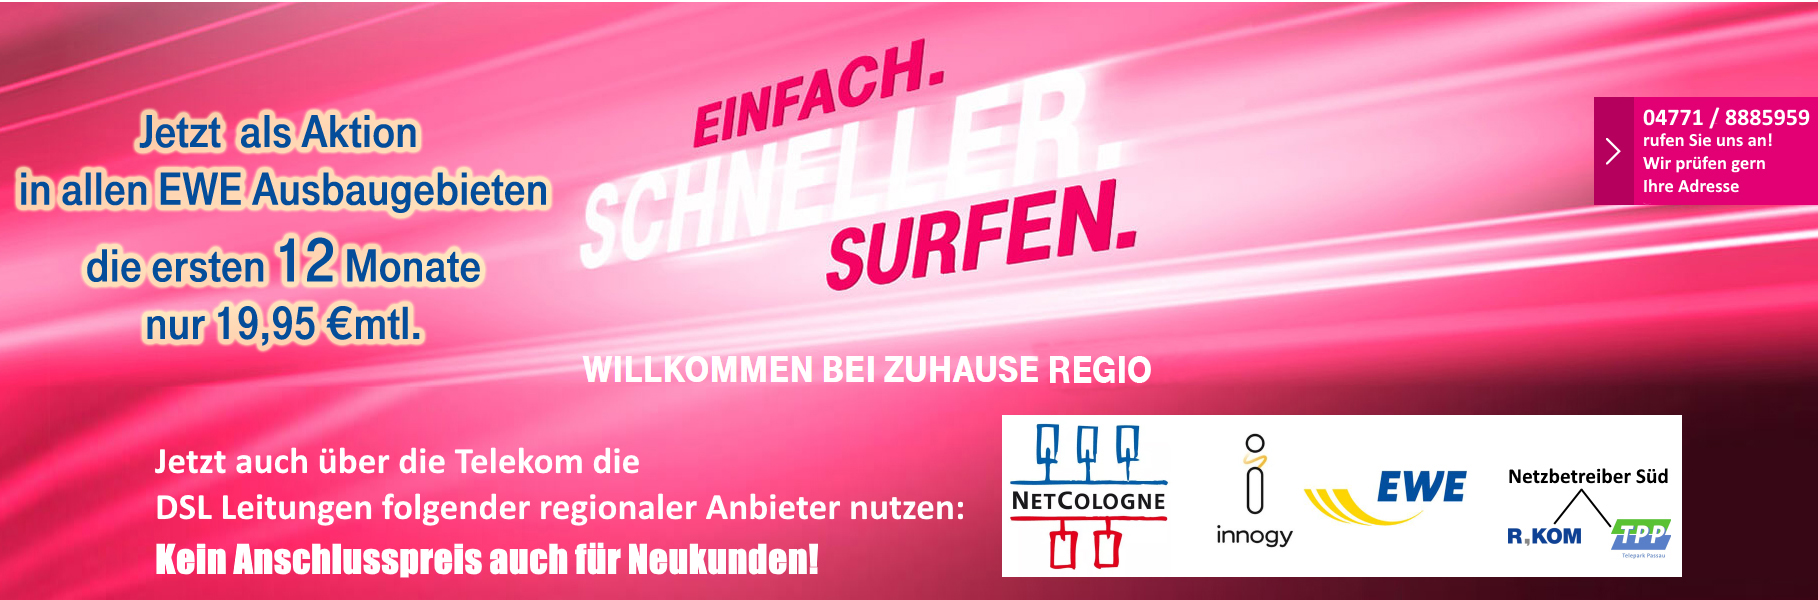 Nicotel Mobilfunk Magentazuhause Regio